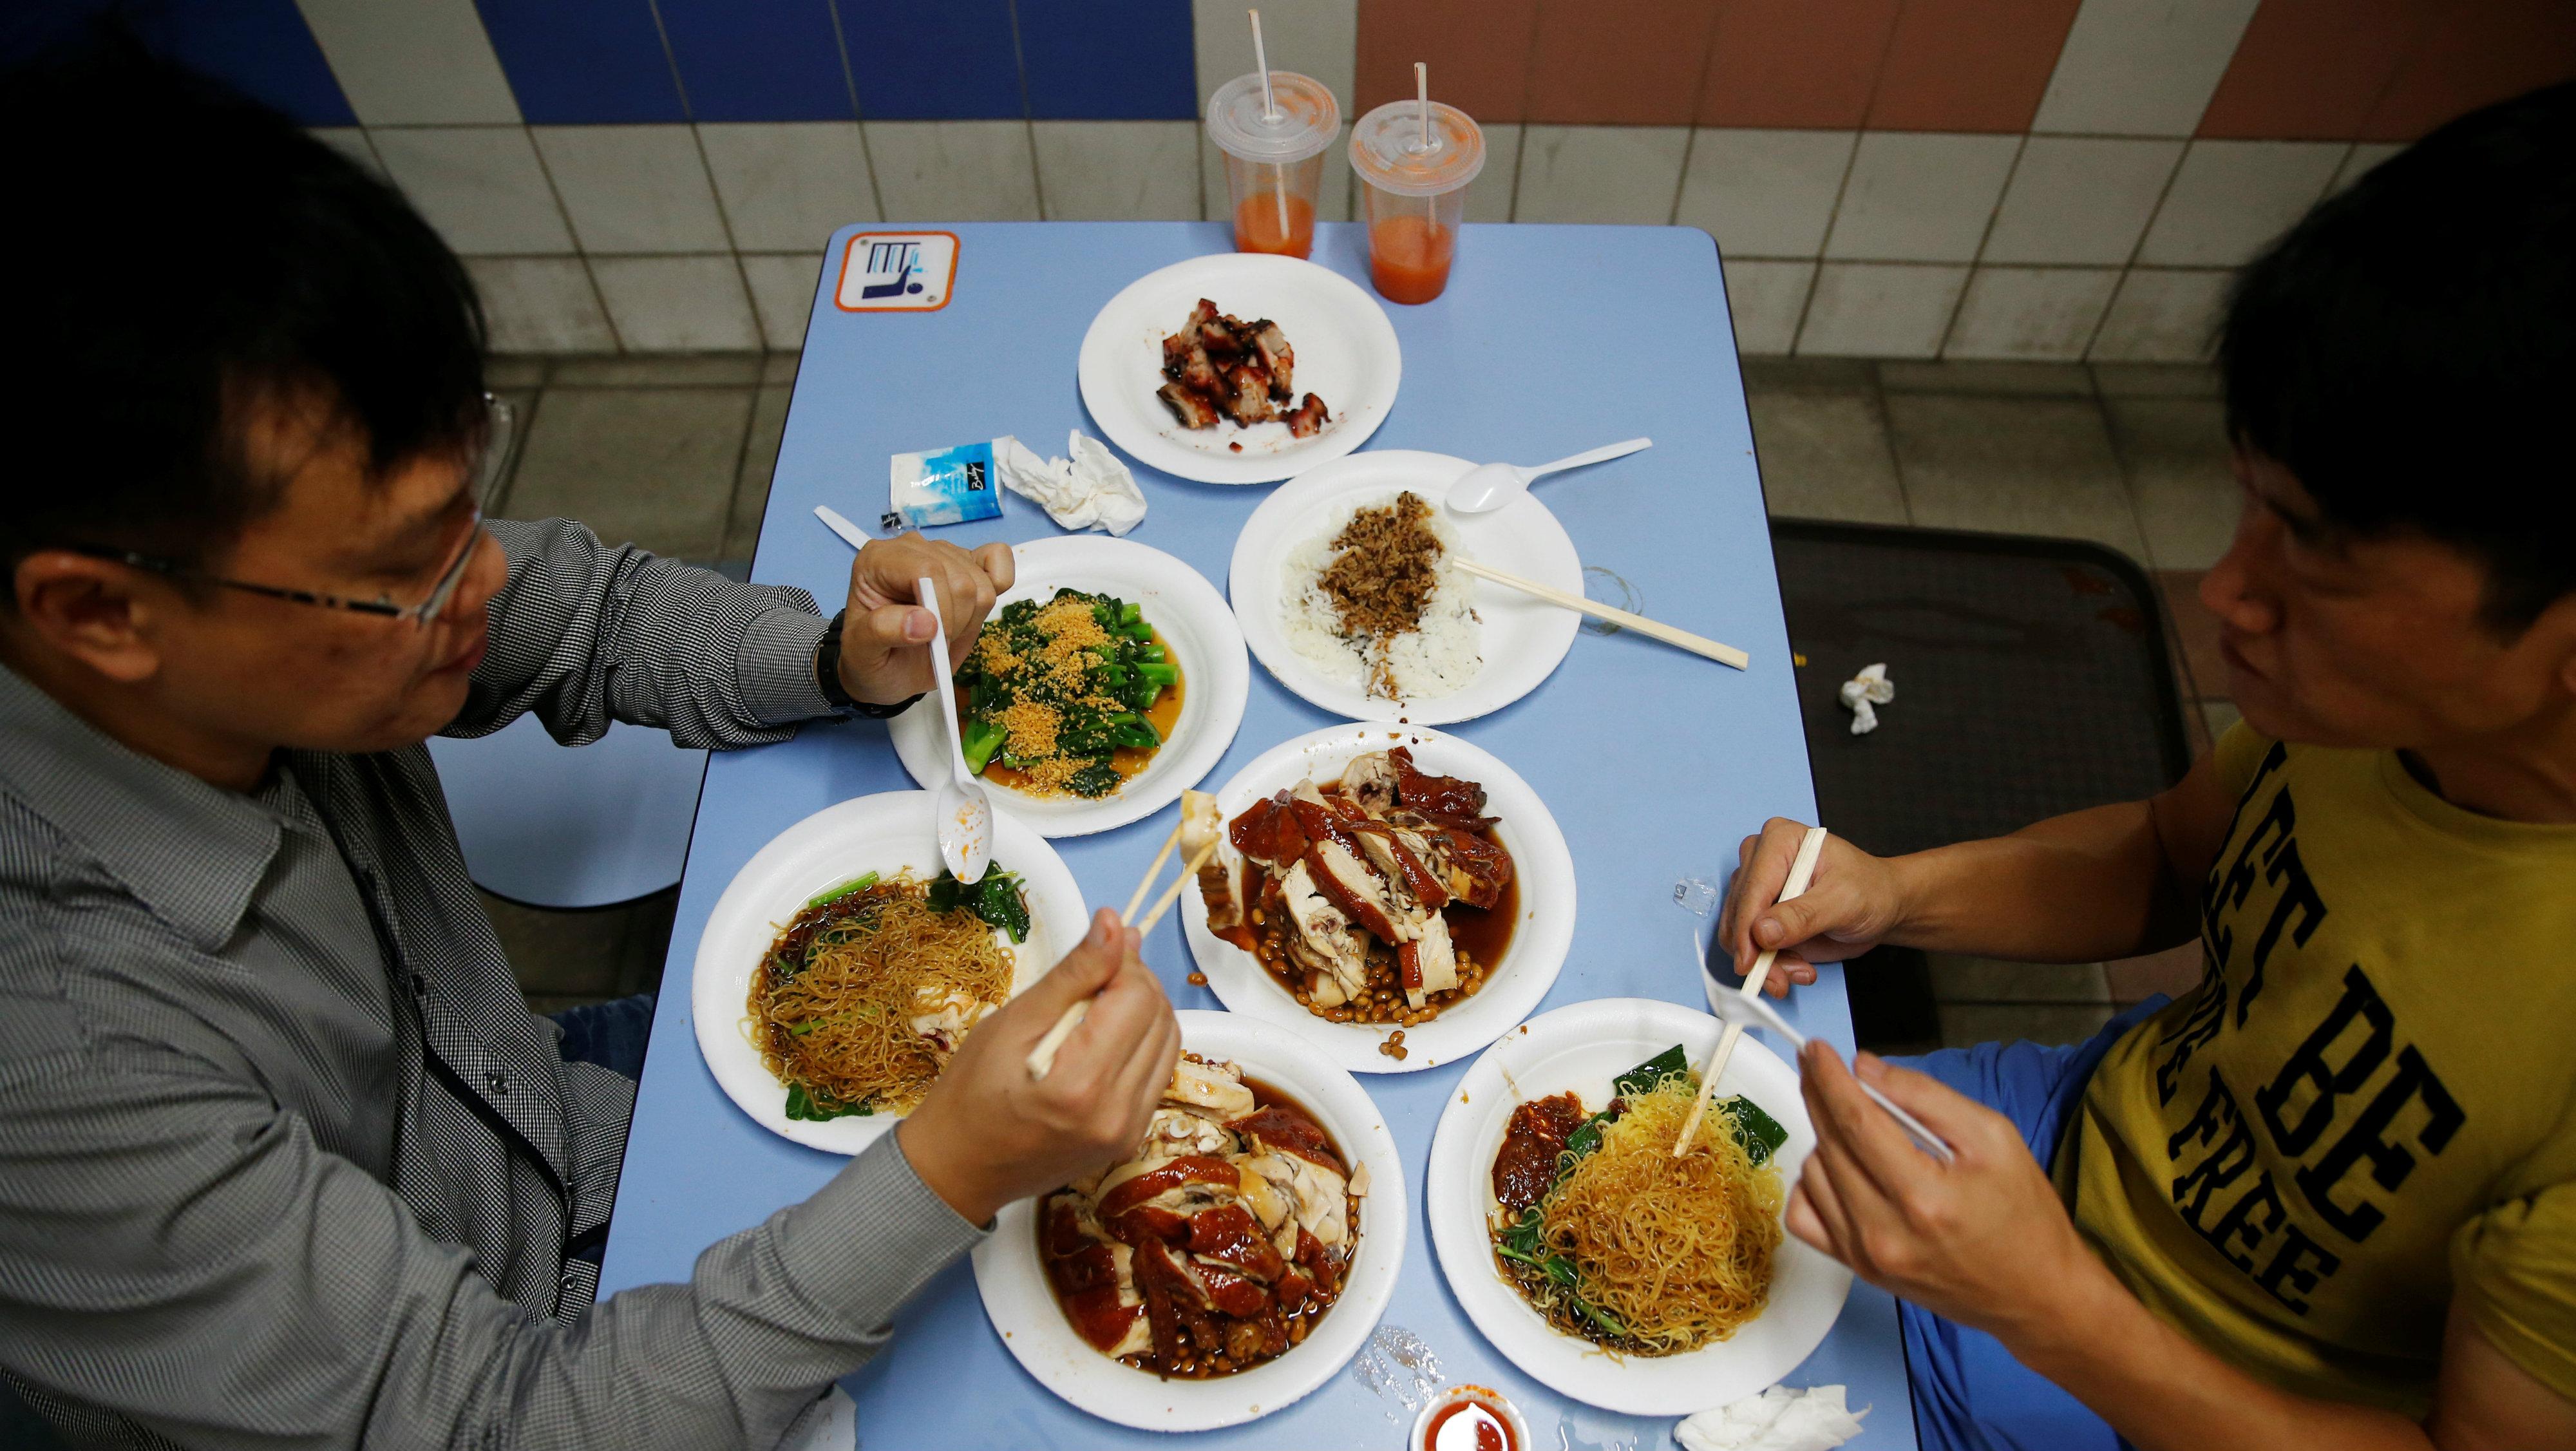 Asian restaurant meal